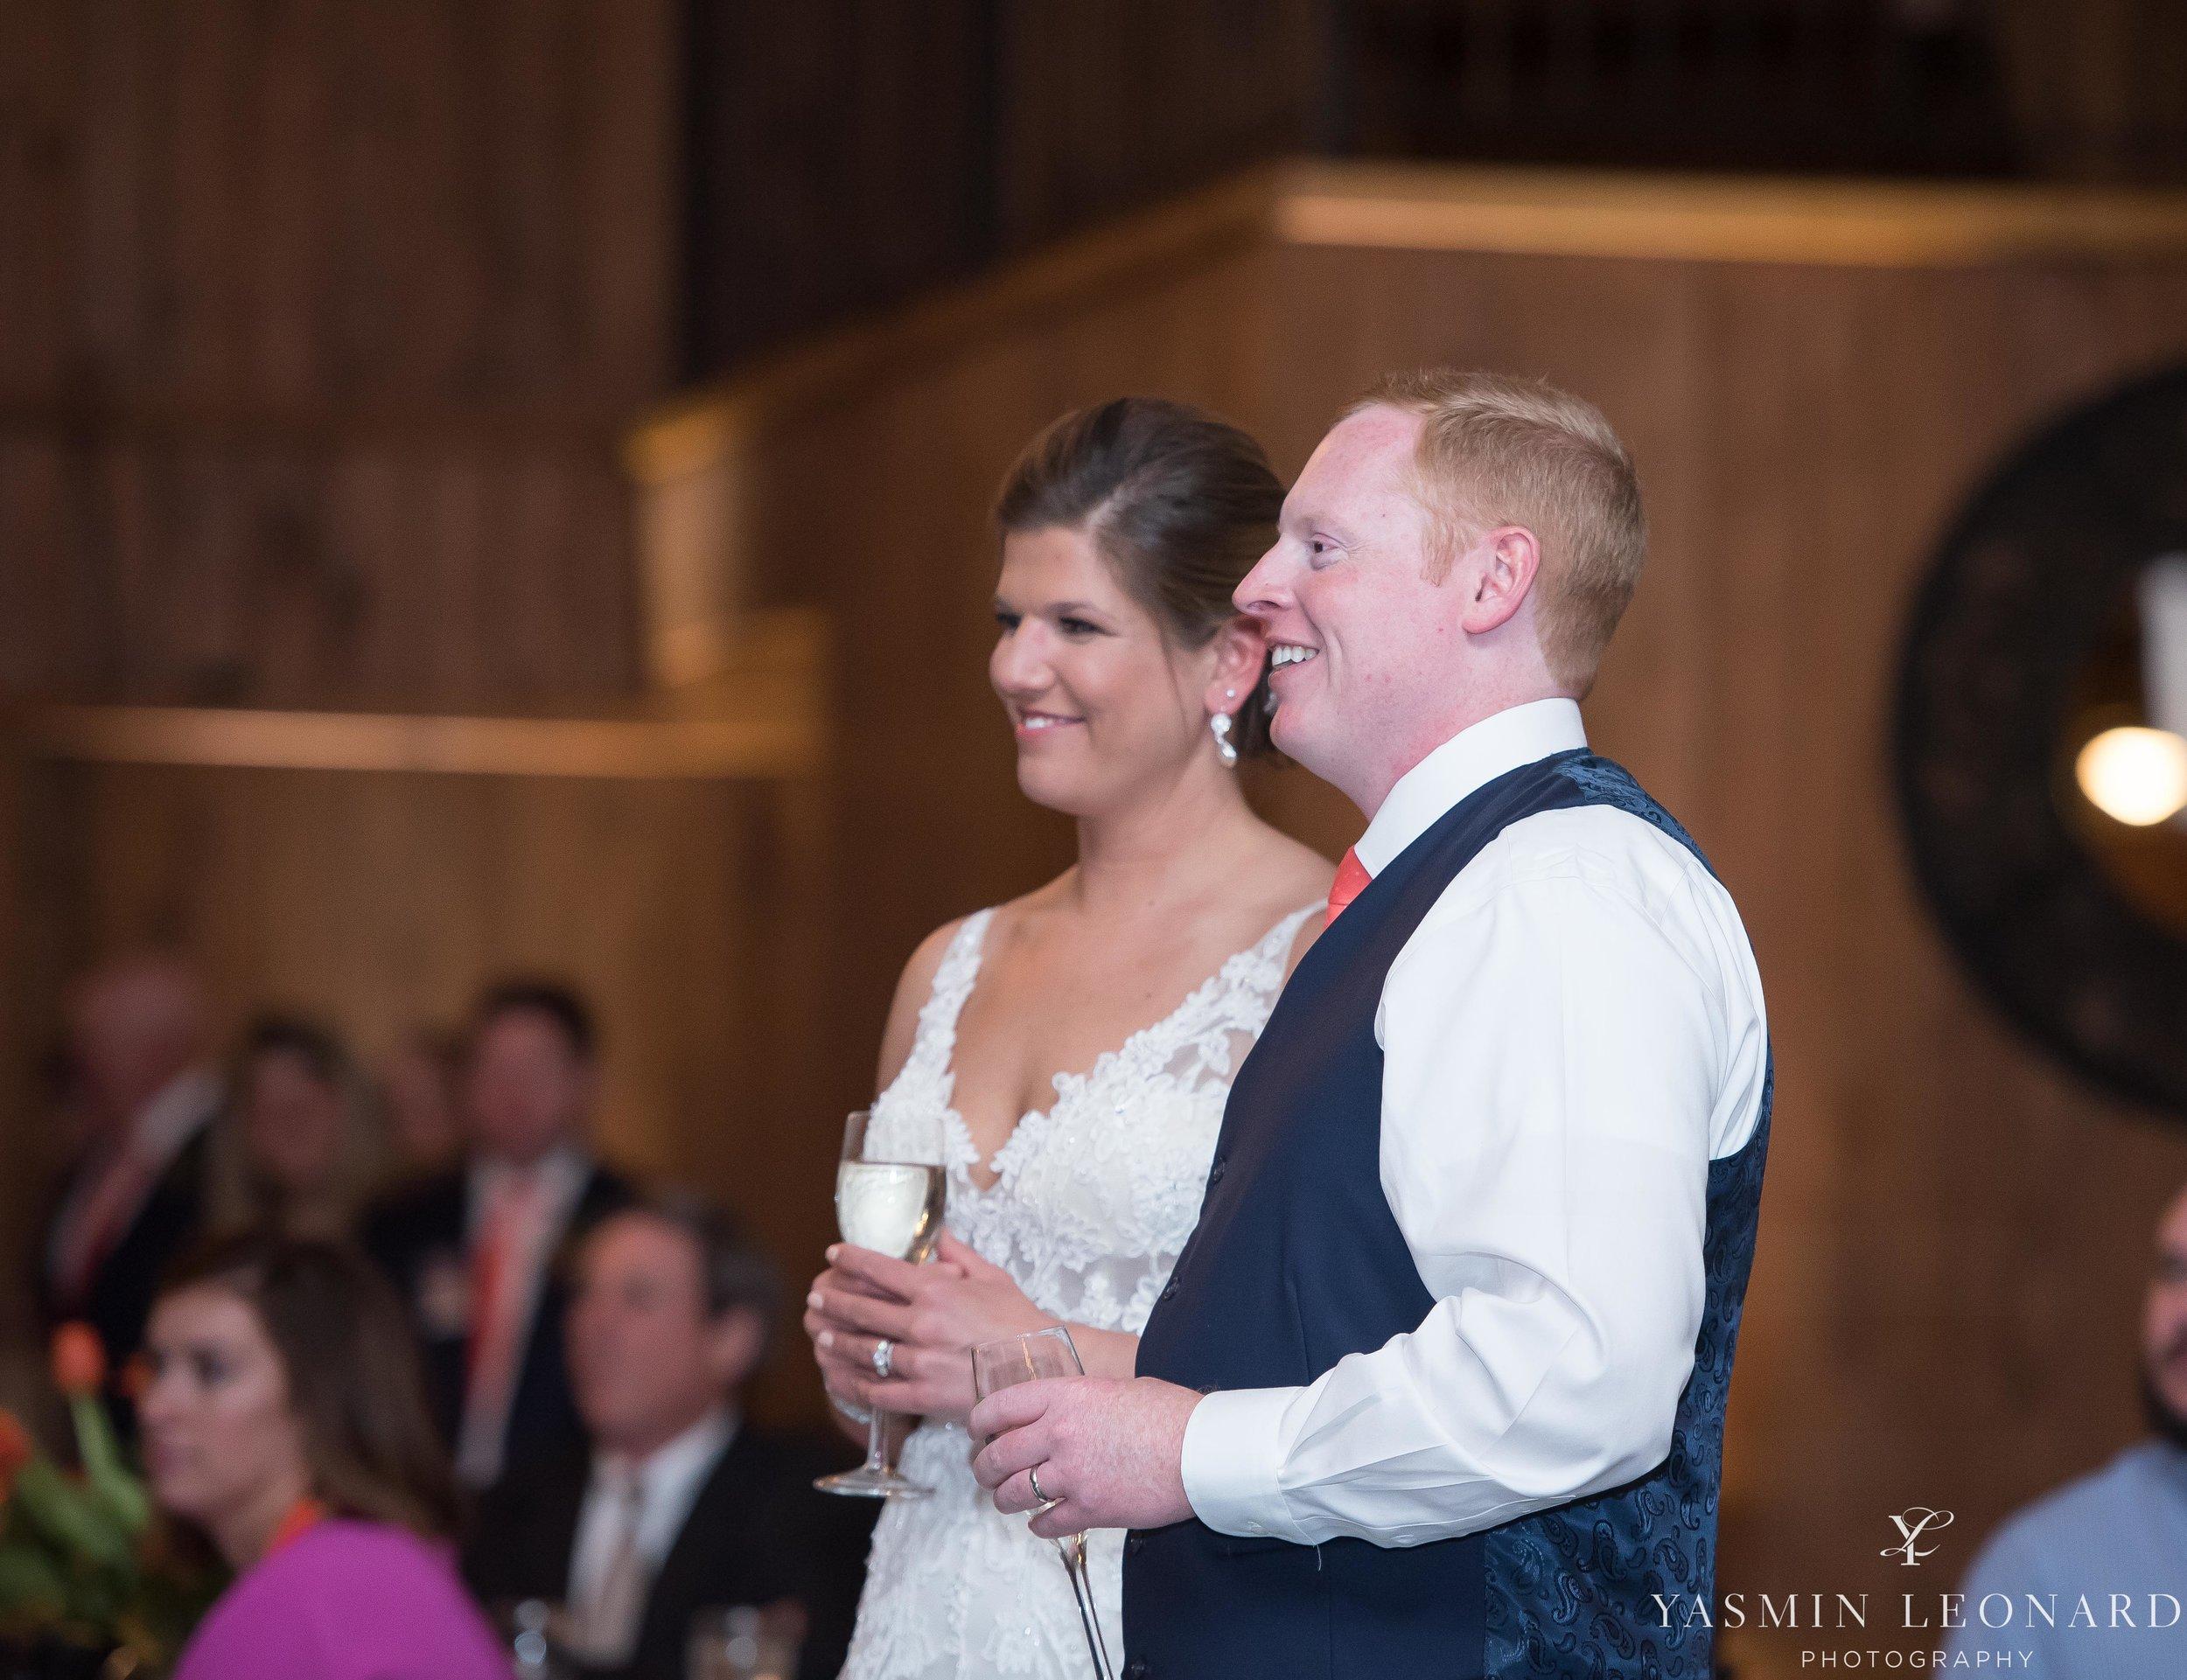 Adaumont Farm - Adaumont Farm Weddings - Trinity Weddings - NC Weddings - Yasmin Leonard Photography-69.jpg